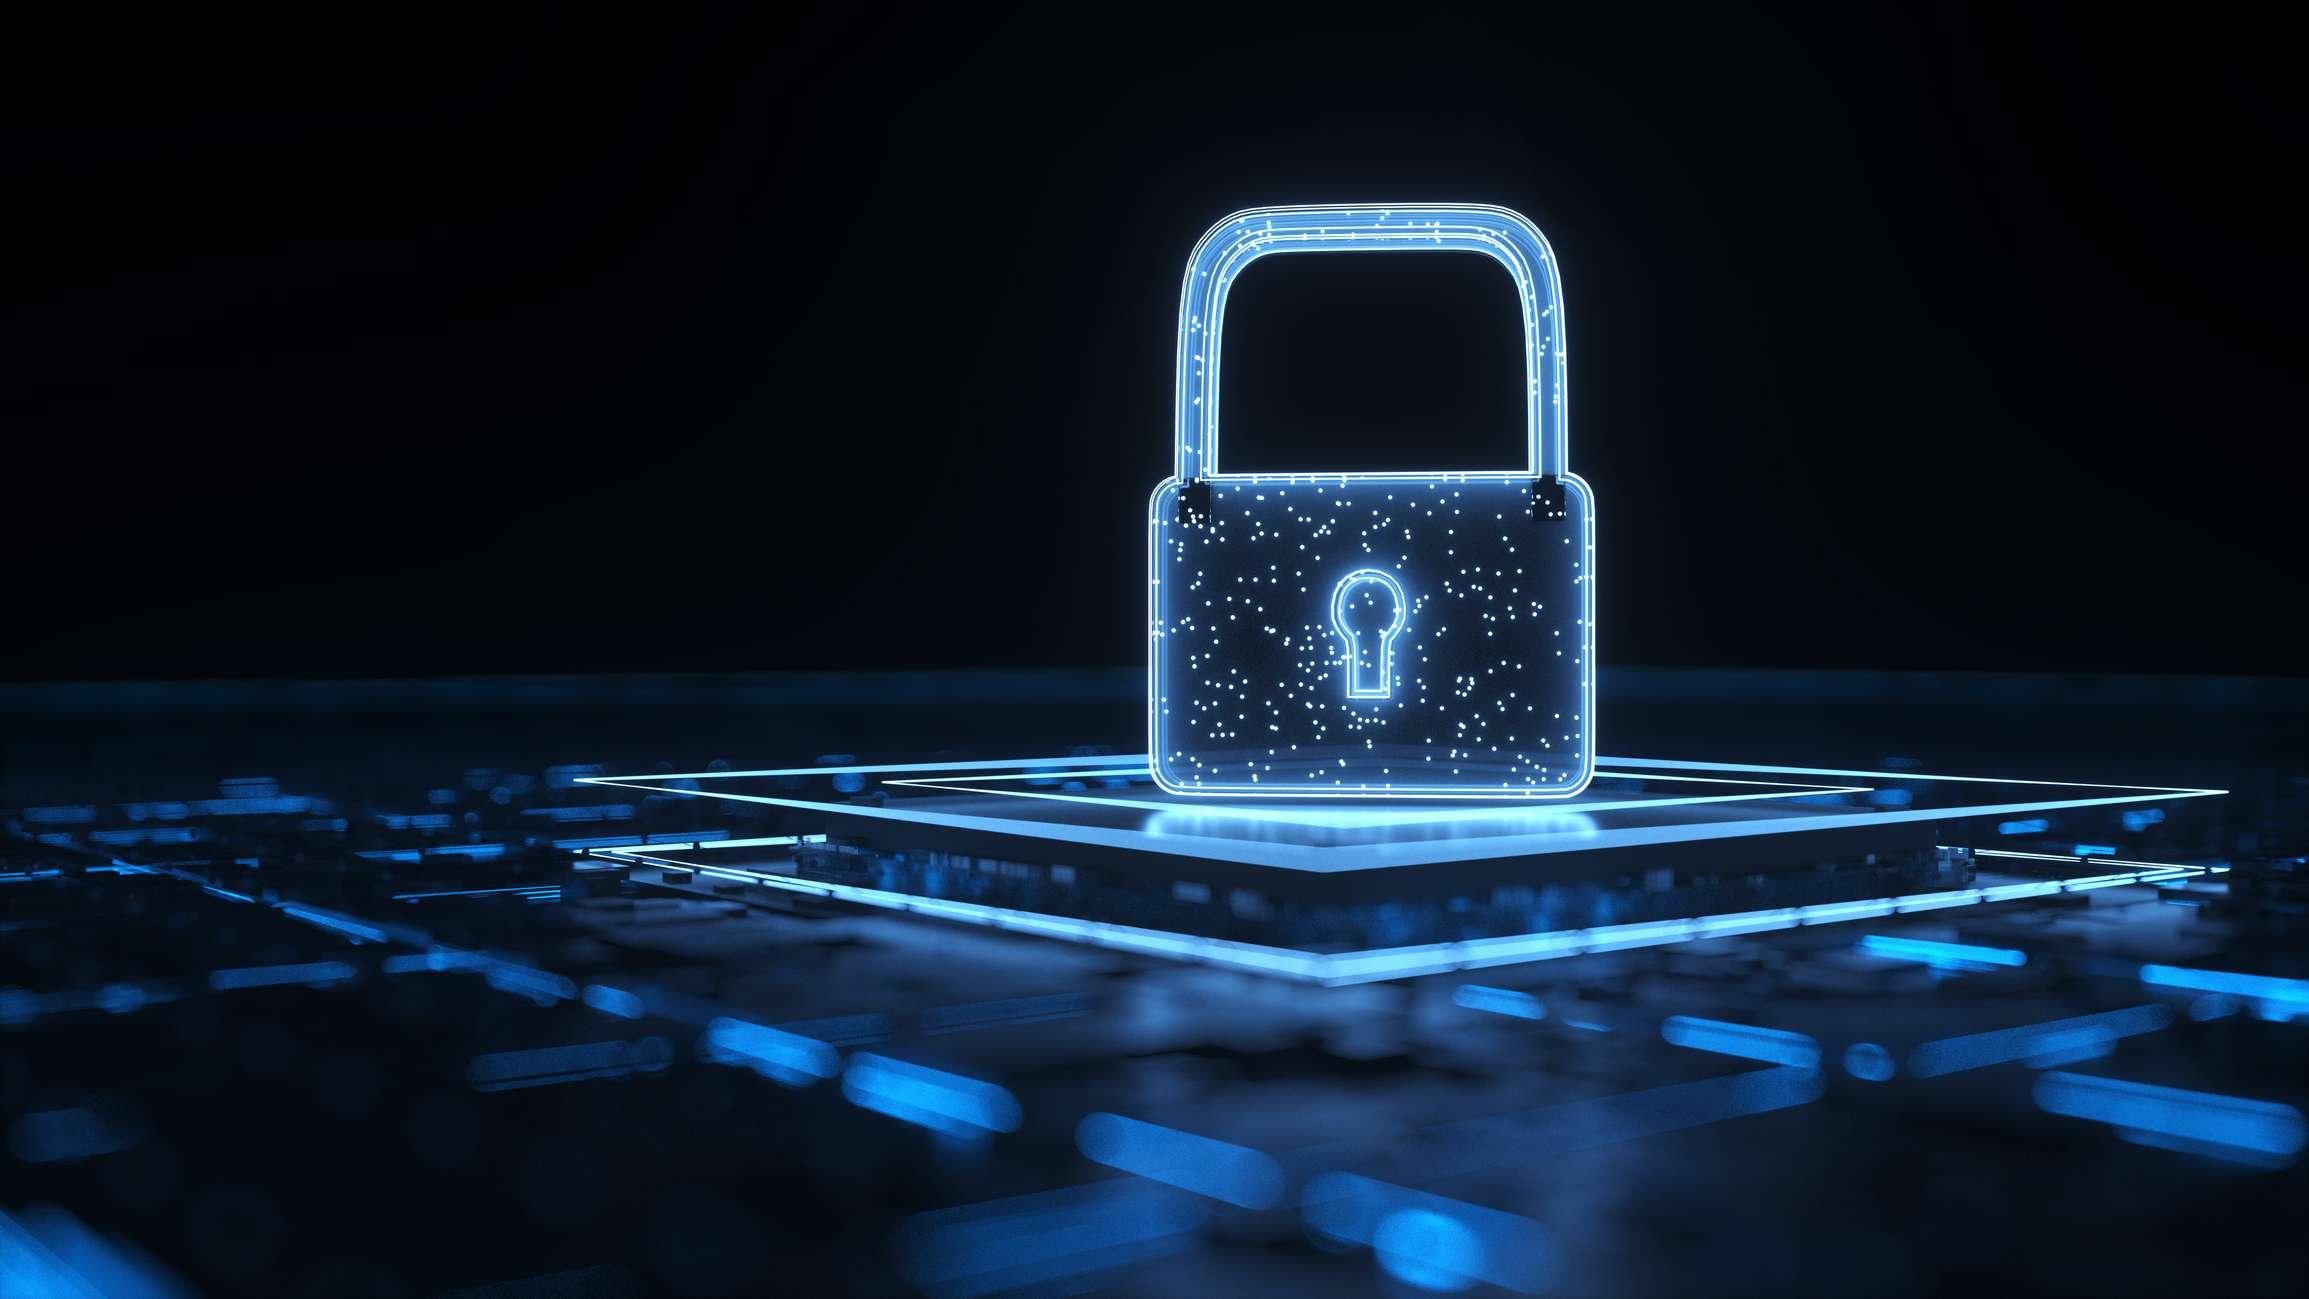 Digital lock protecting information